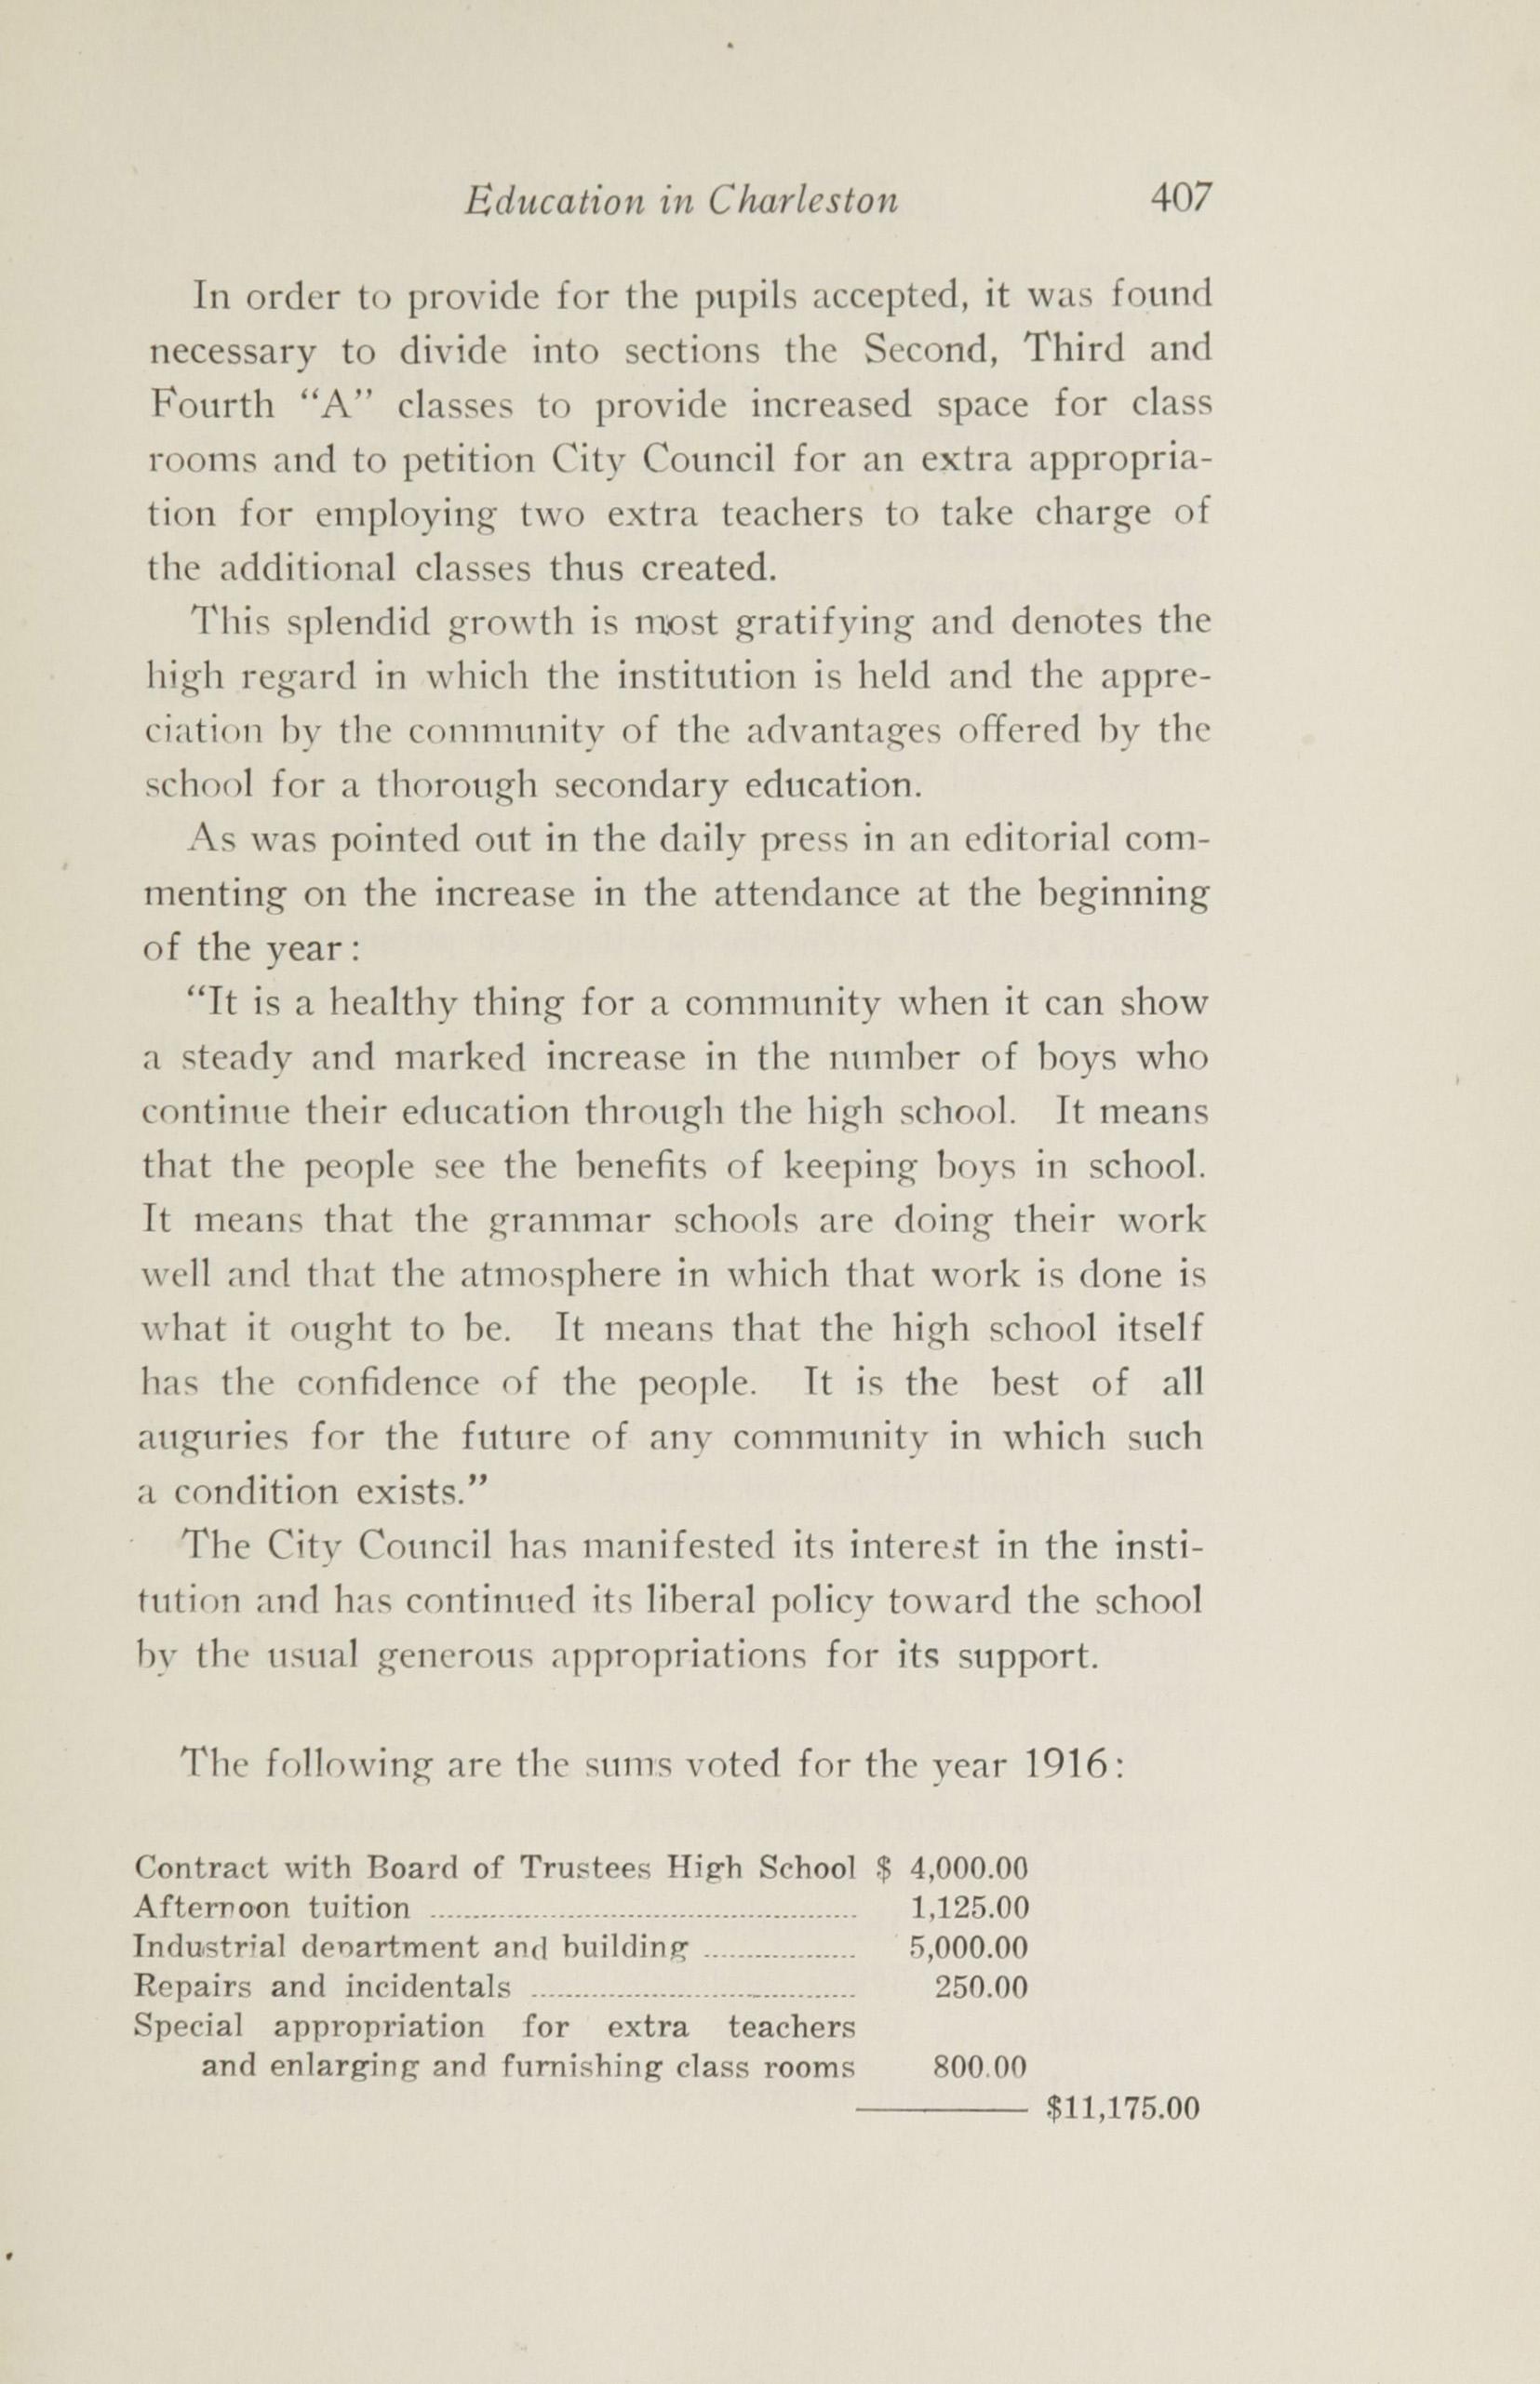 Charleston Yearbook, 1916, page 407